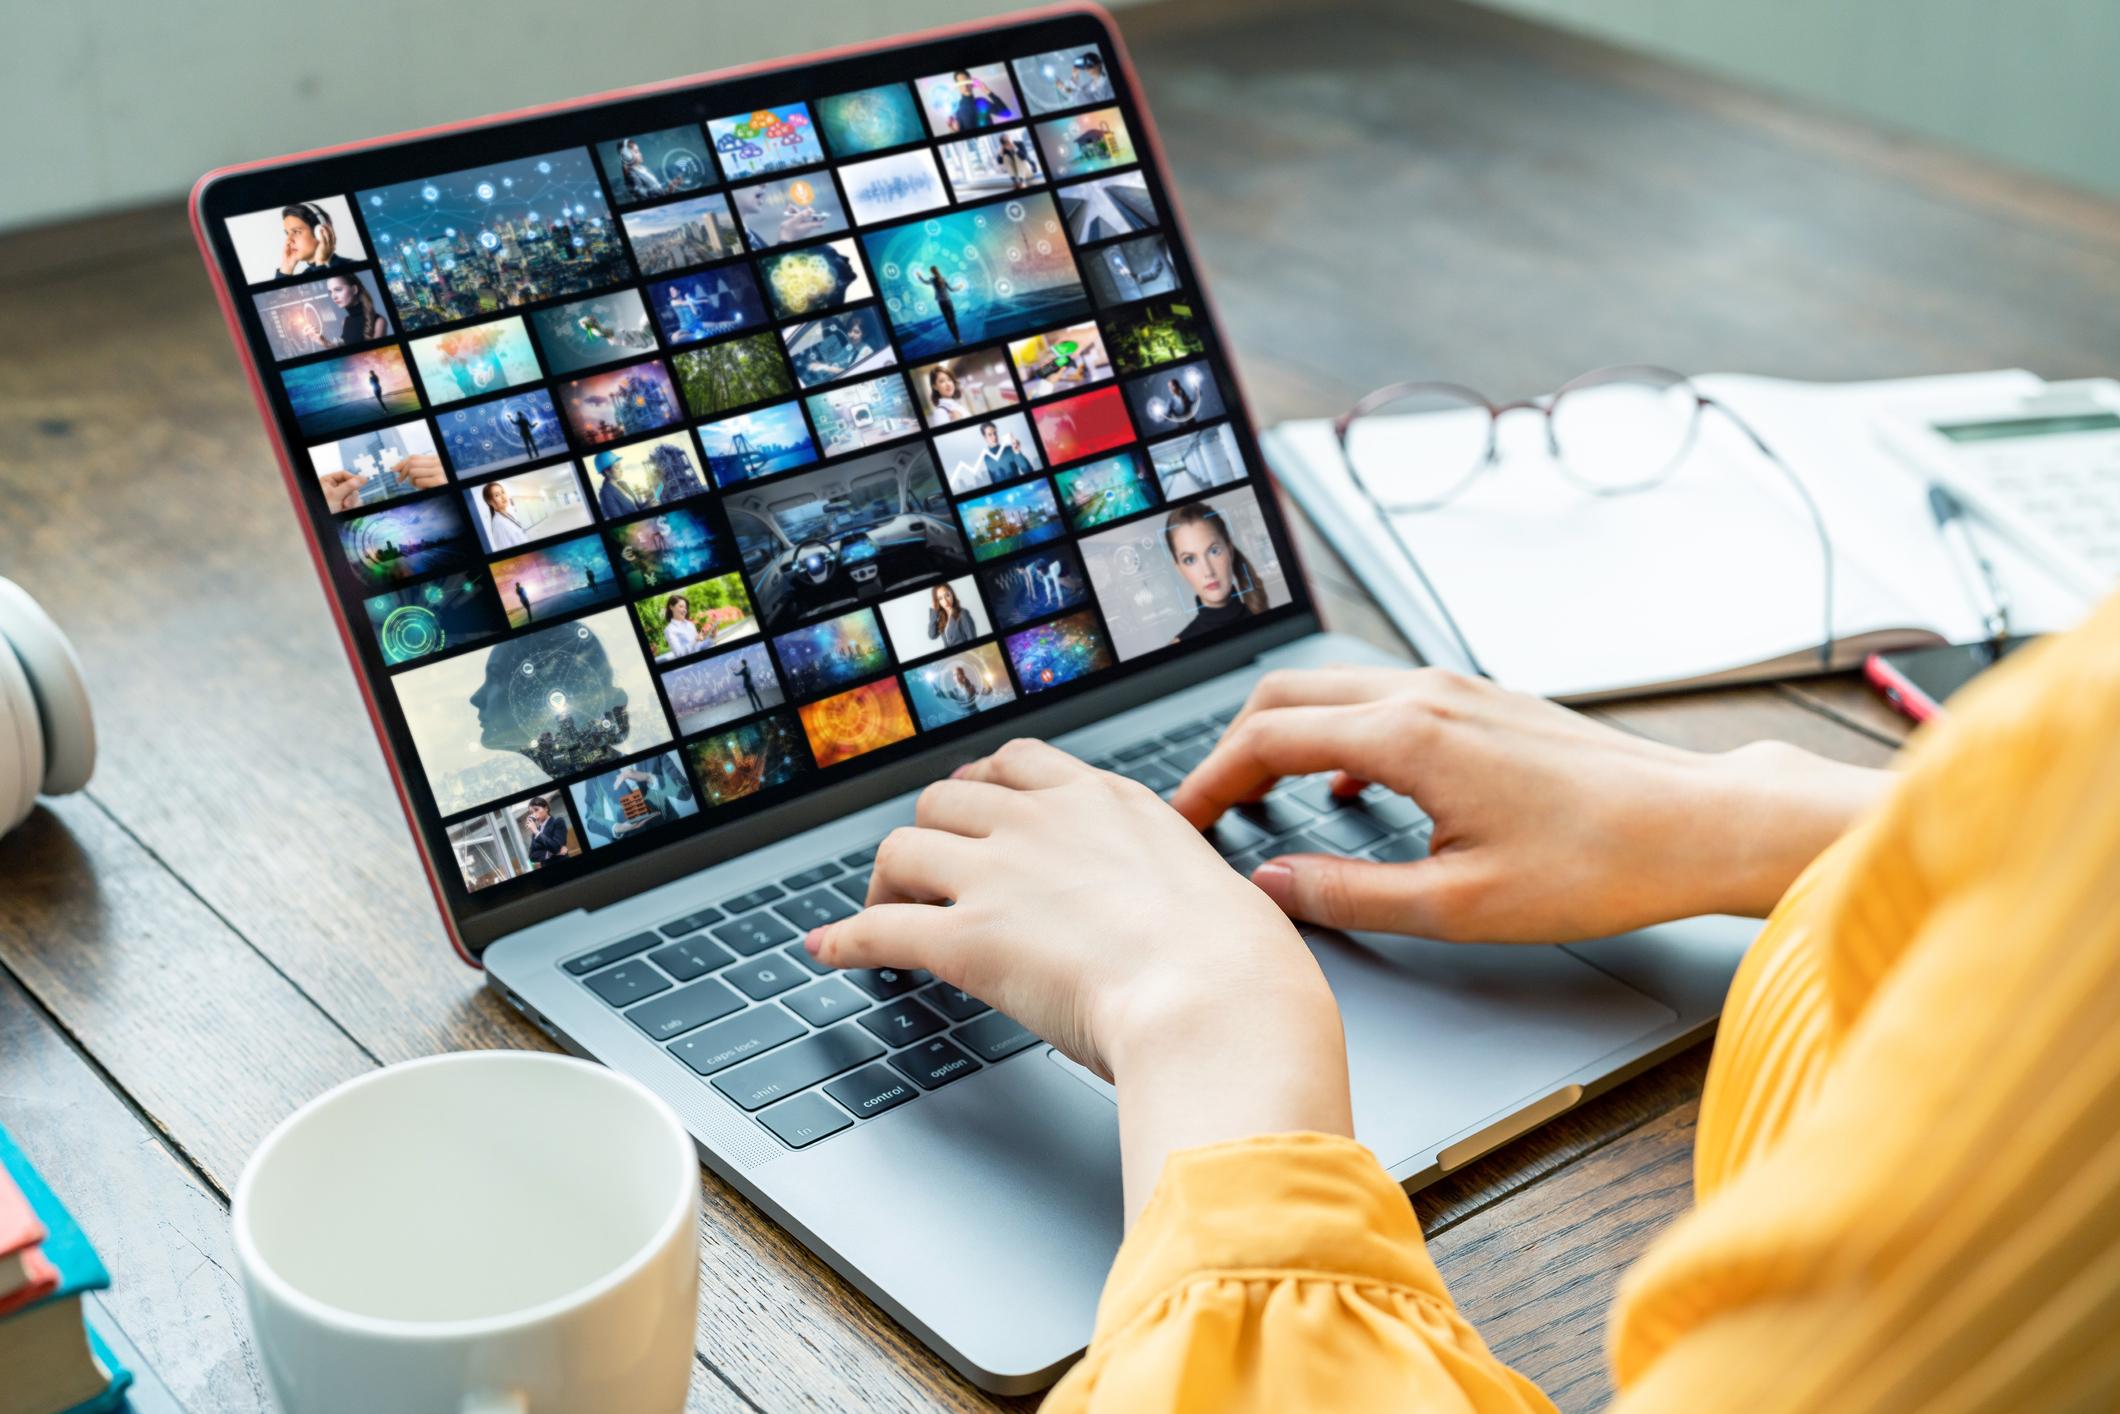 Indo XXI Tutup, Ini 9 Alternatif Streaming Film Lainnya